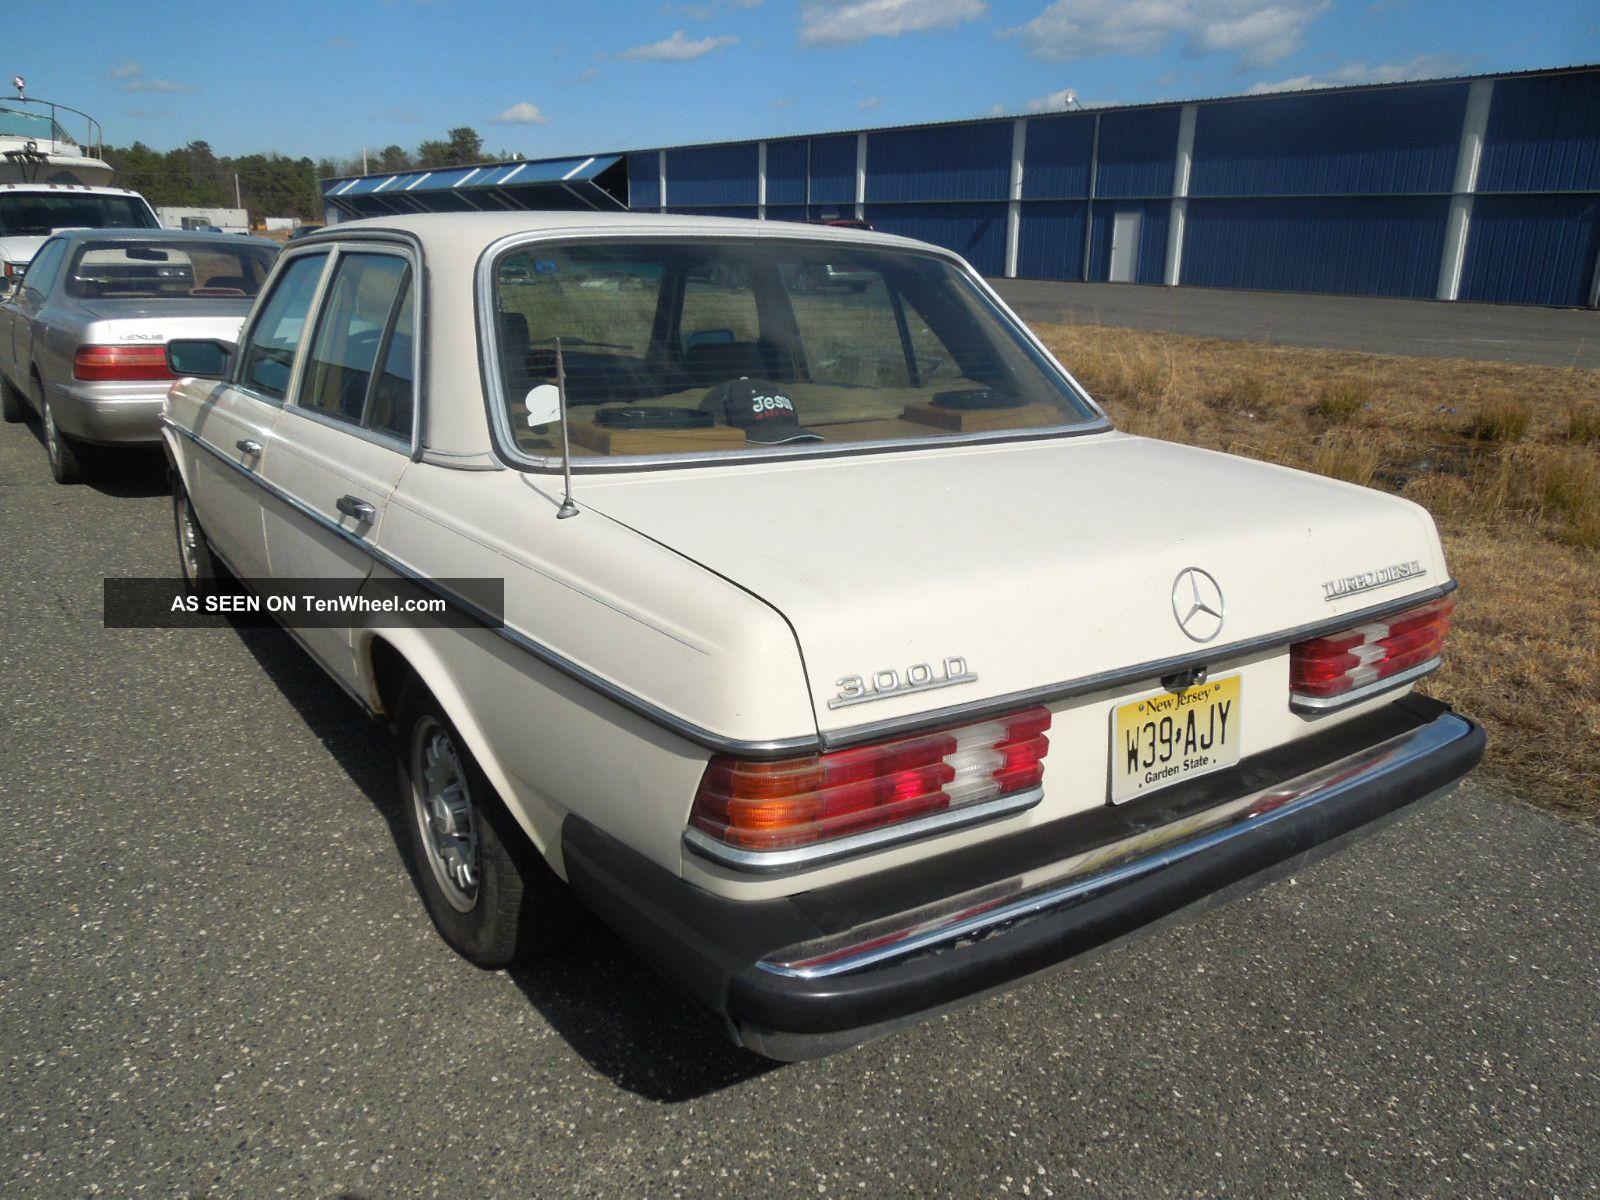 1983 mercedes benz 300d turbo diesel automatic rust for Mercedes benz 300d